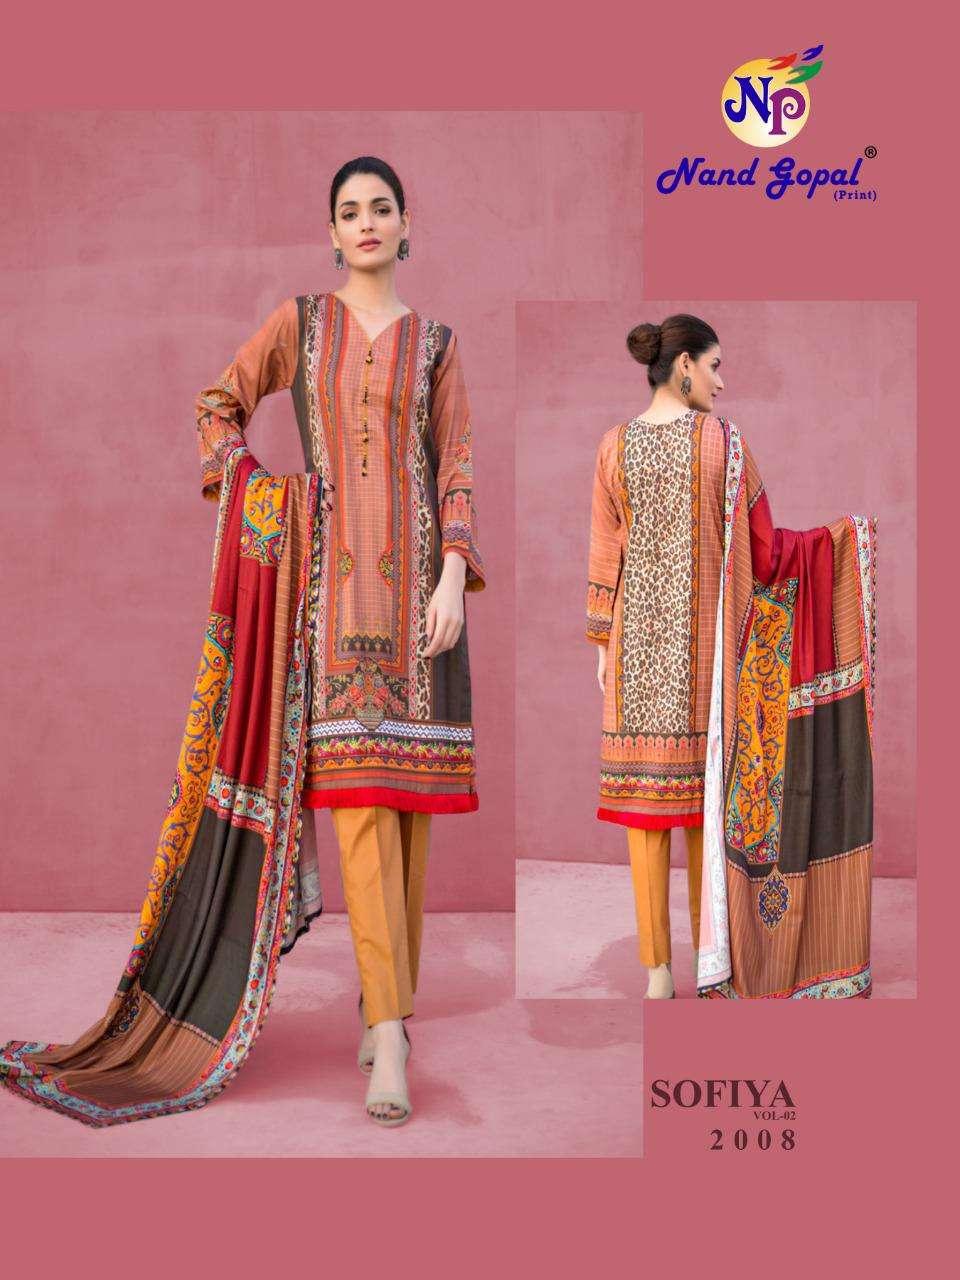 Nand Gopal Sofiya Vol 1 Pure Cotton Karachi Print Dress Material Collection